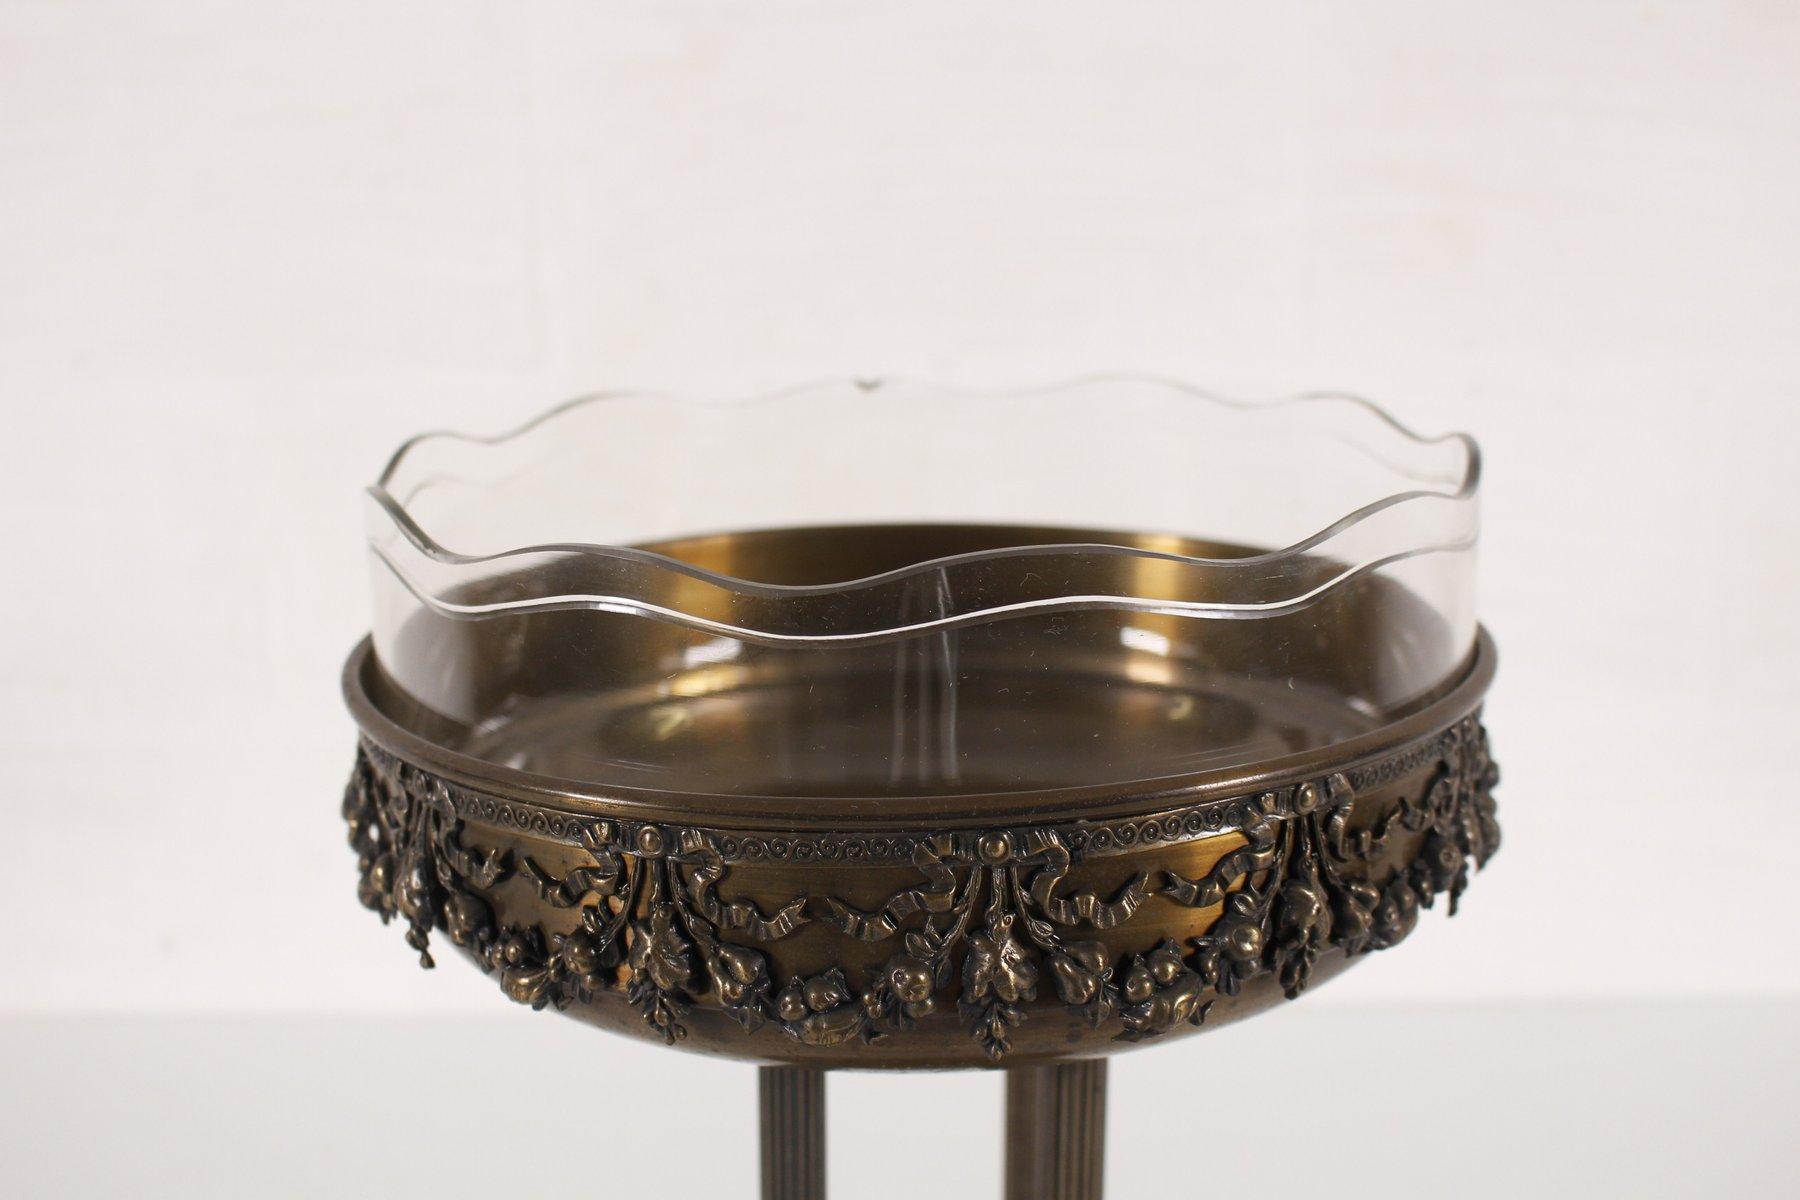 vase vintage art d co en m tal et en verre en vente sur pamono. Black Bedroom Furniture Sets. Home Design Ideas